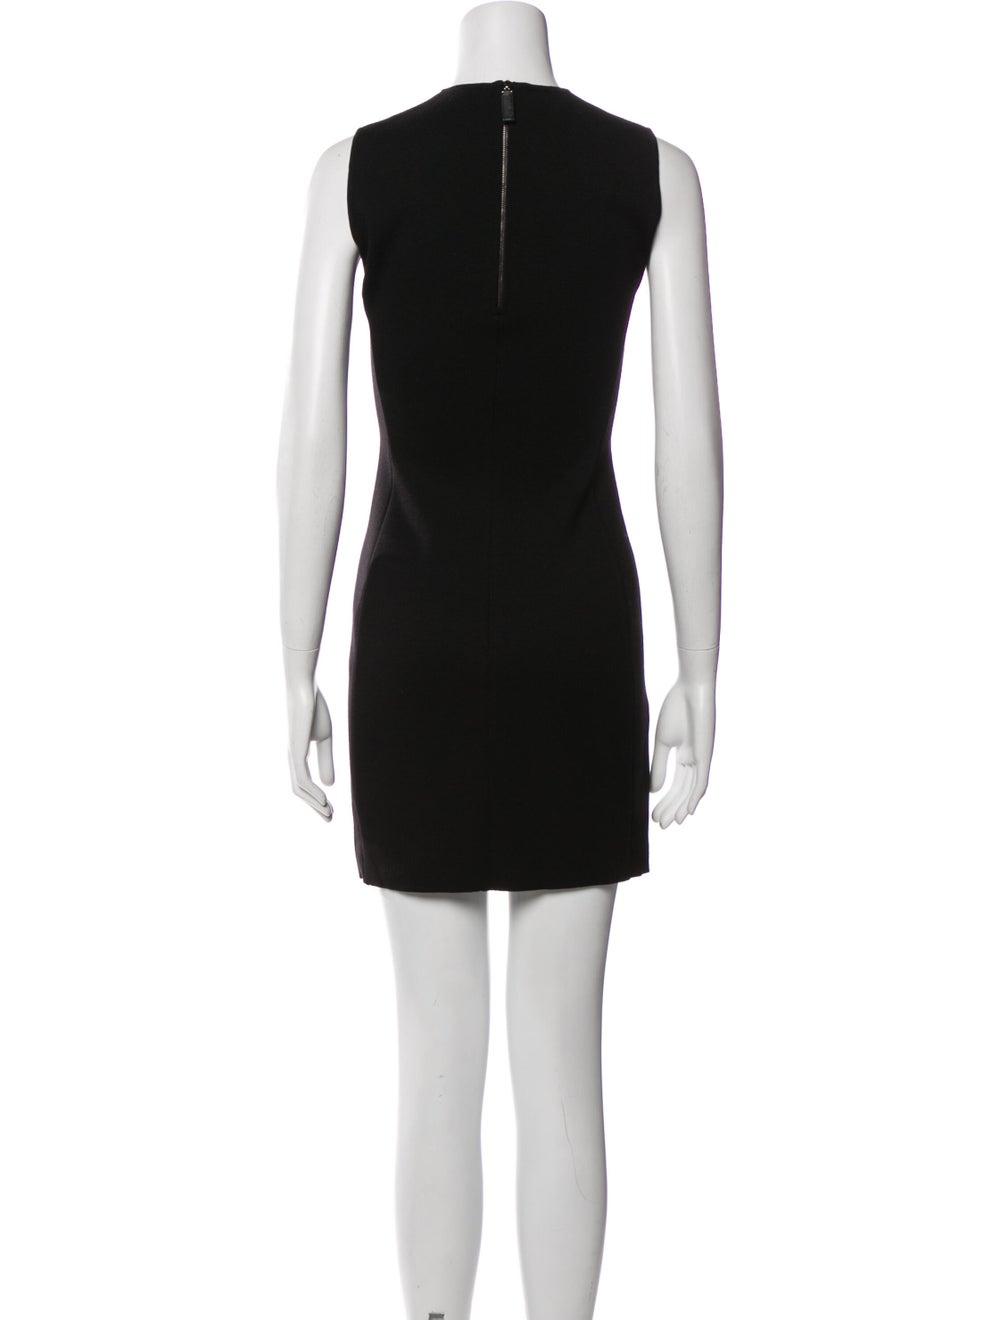 Prada Wool Mini Dress Wool - image 3